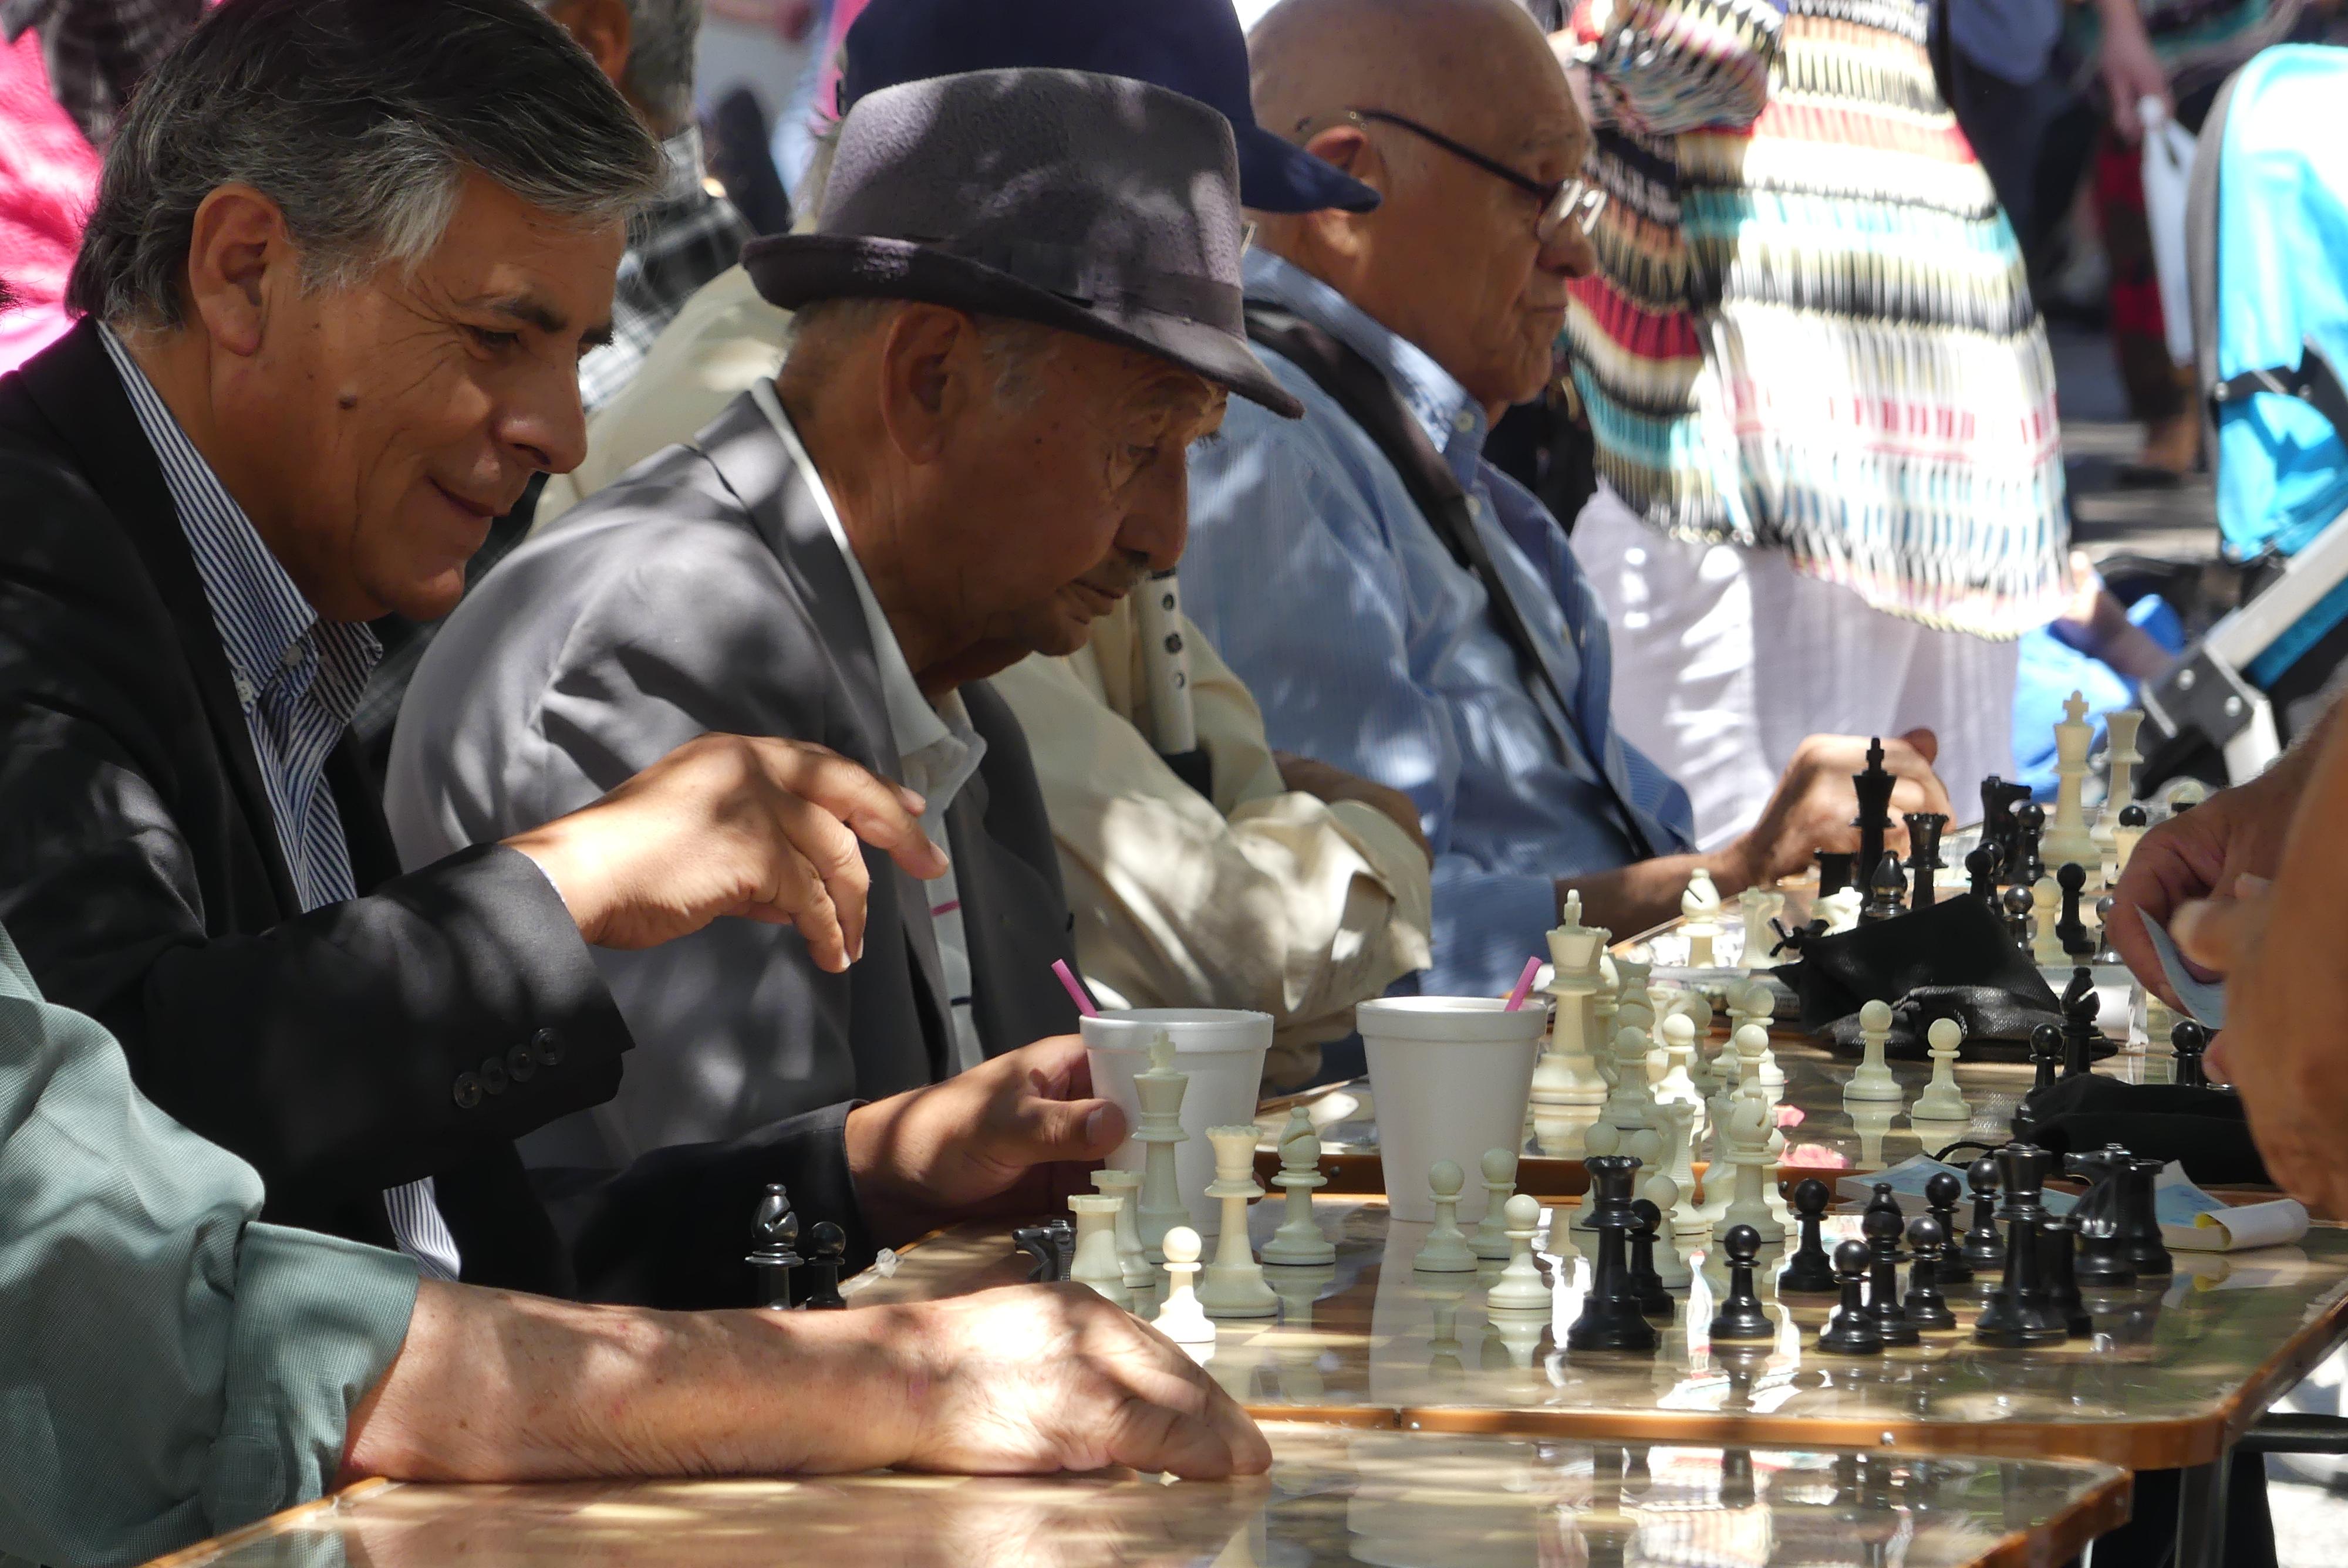 Schachspieler in Santiago de Chile